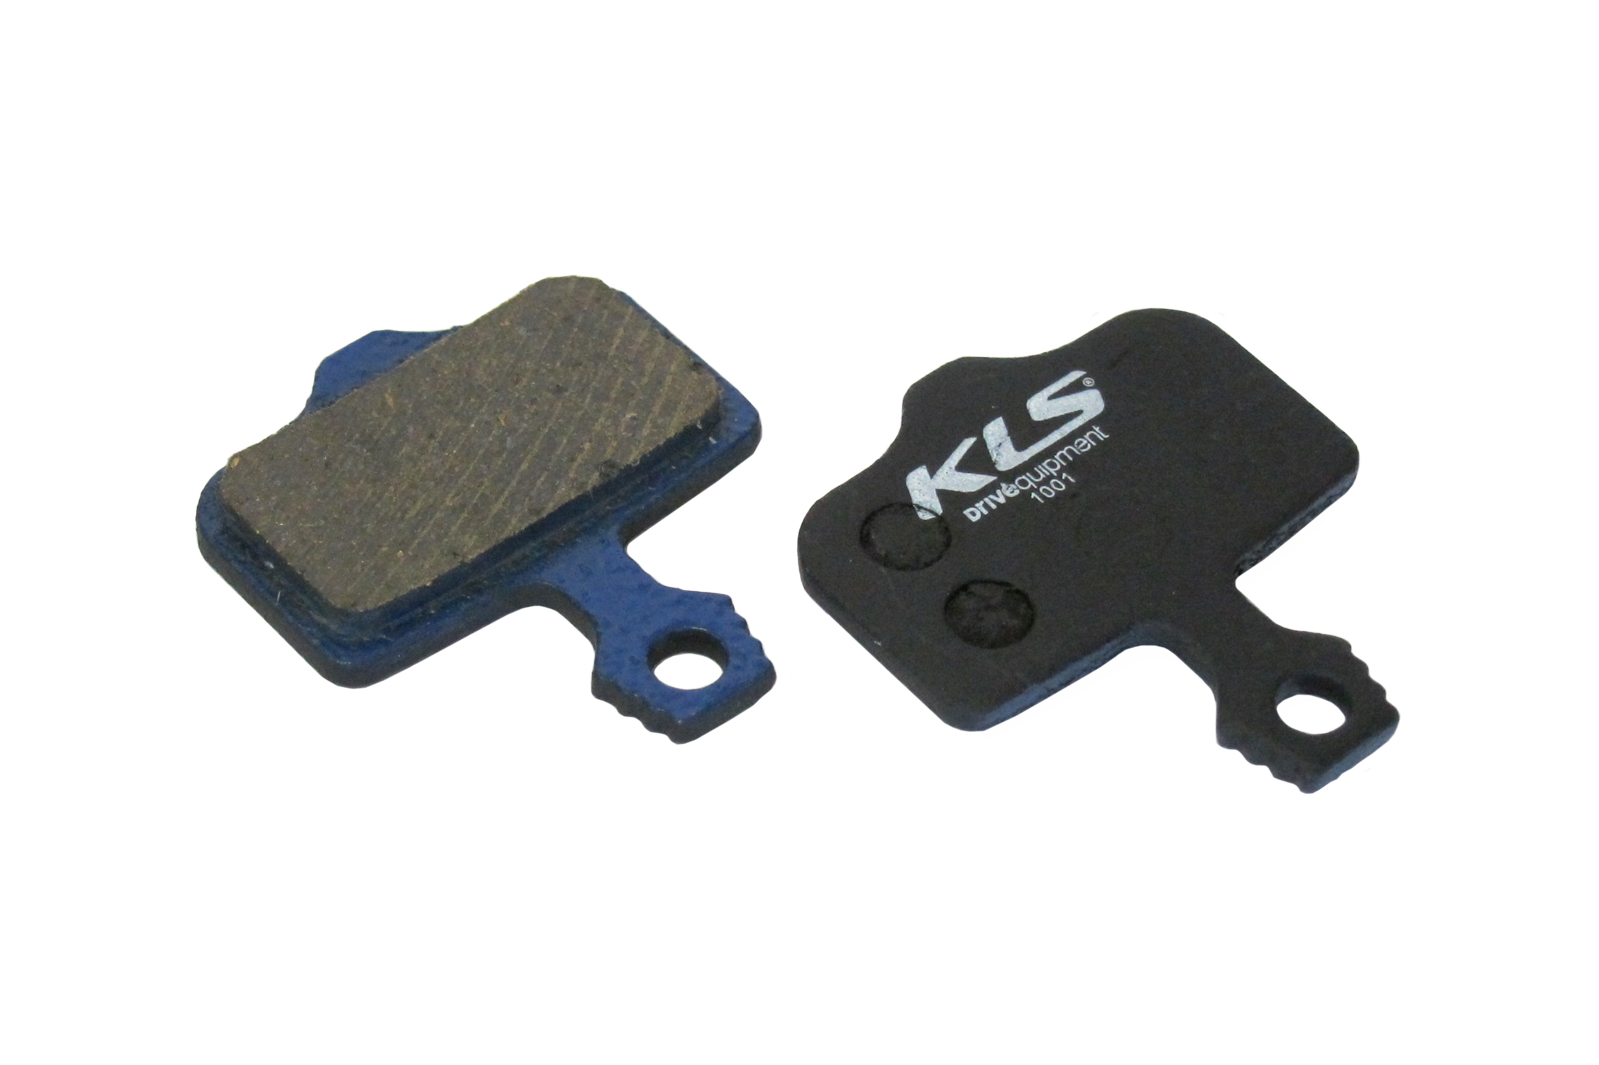 Brzdové destičky KLS D-01, organické